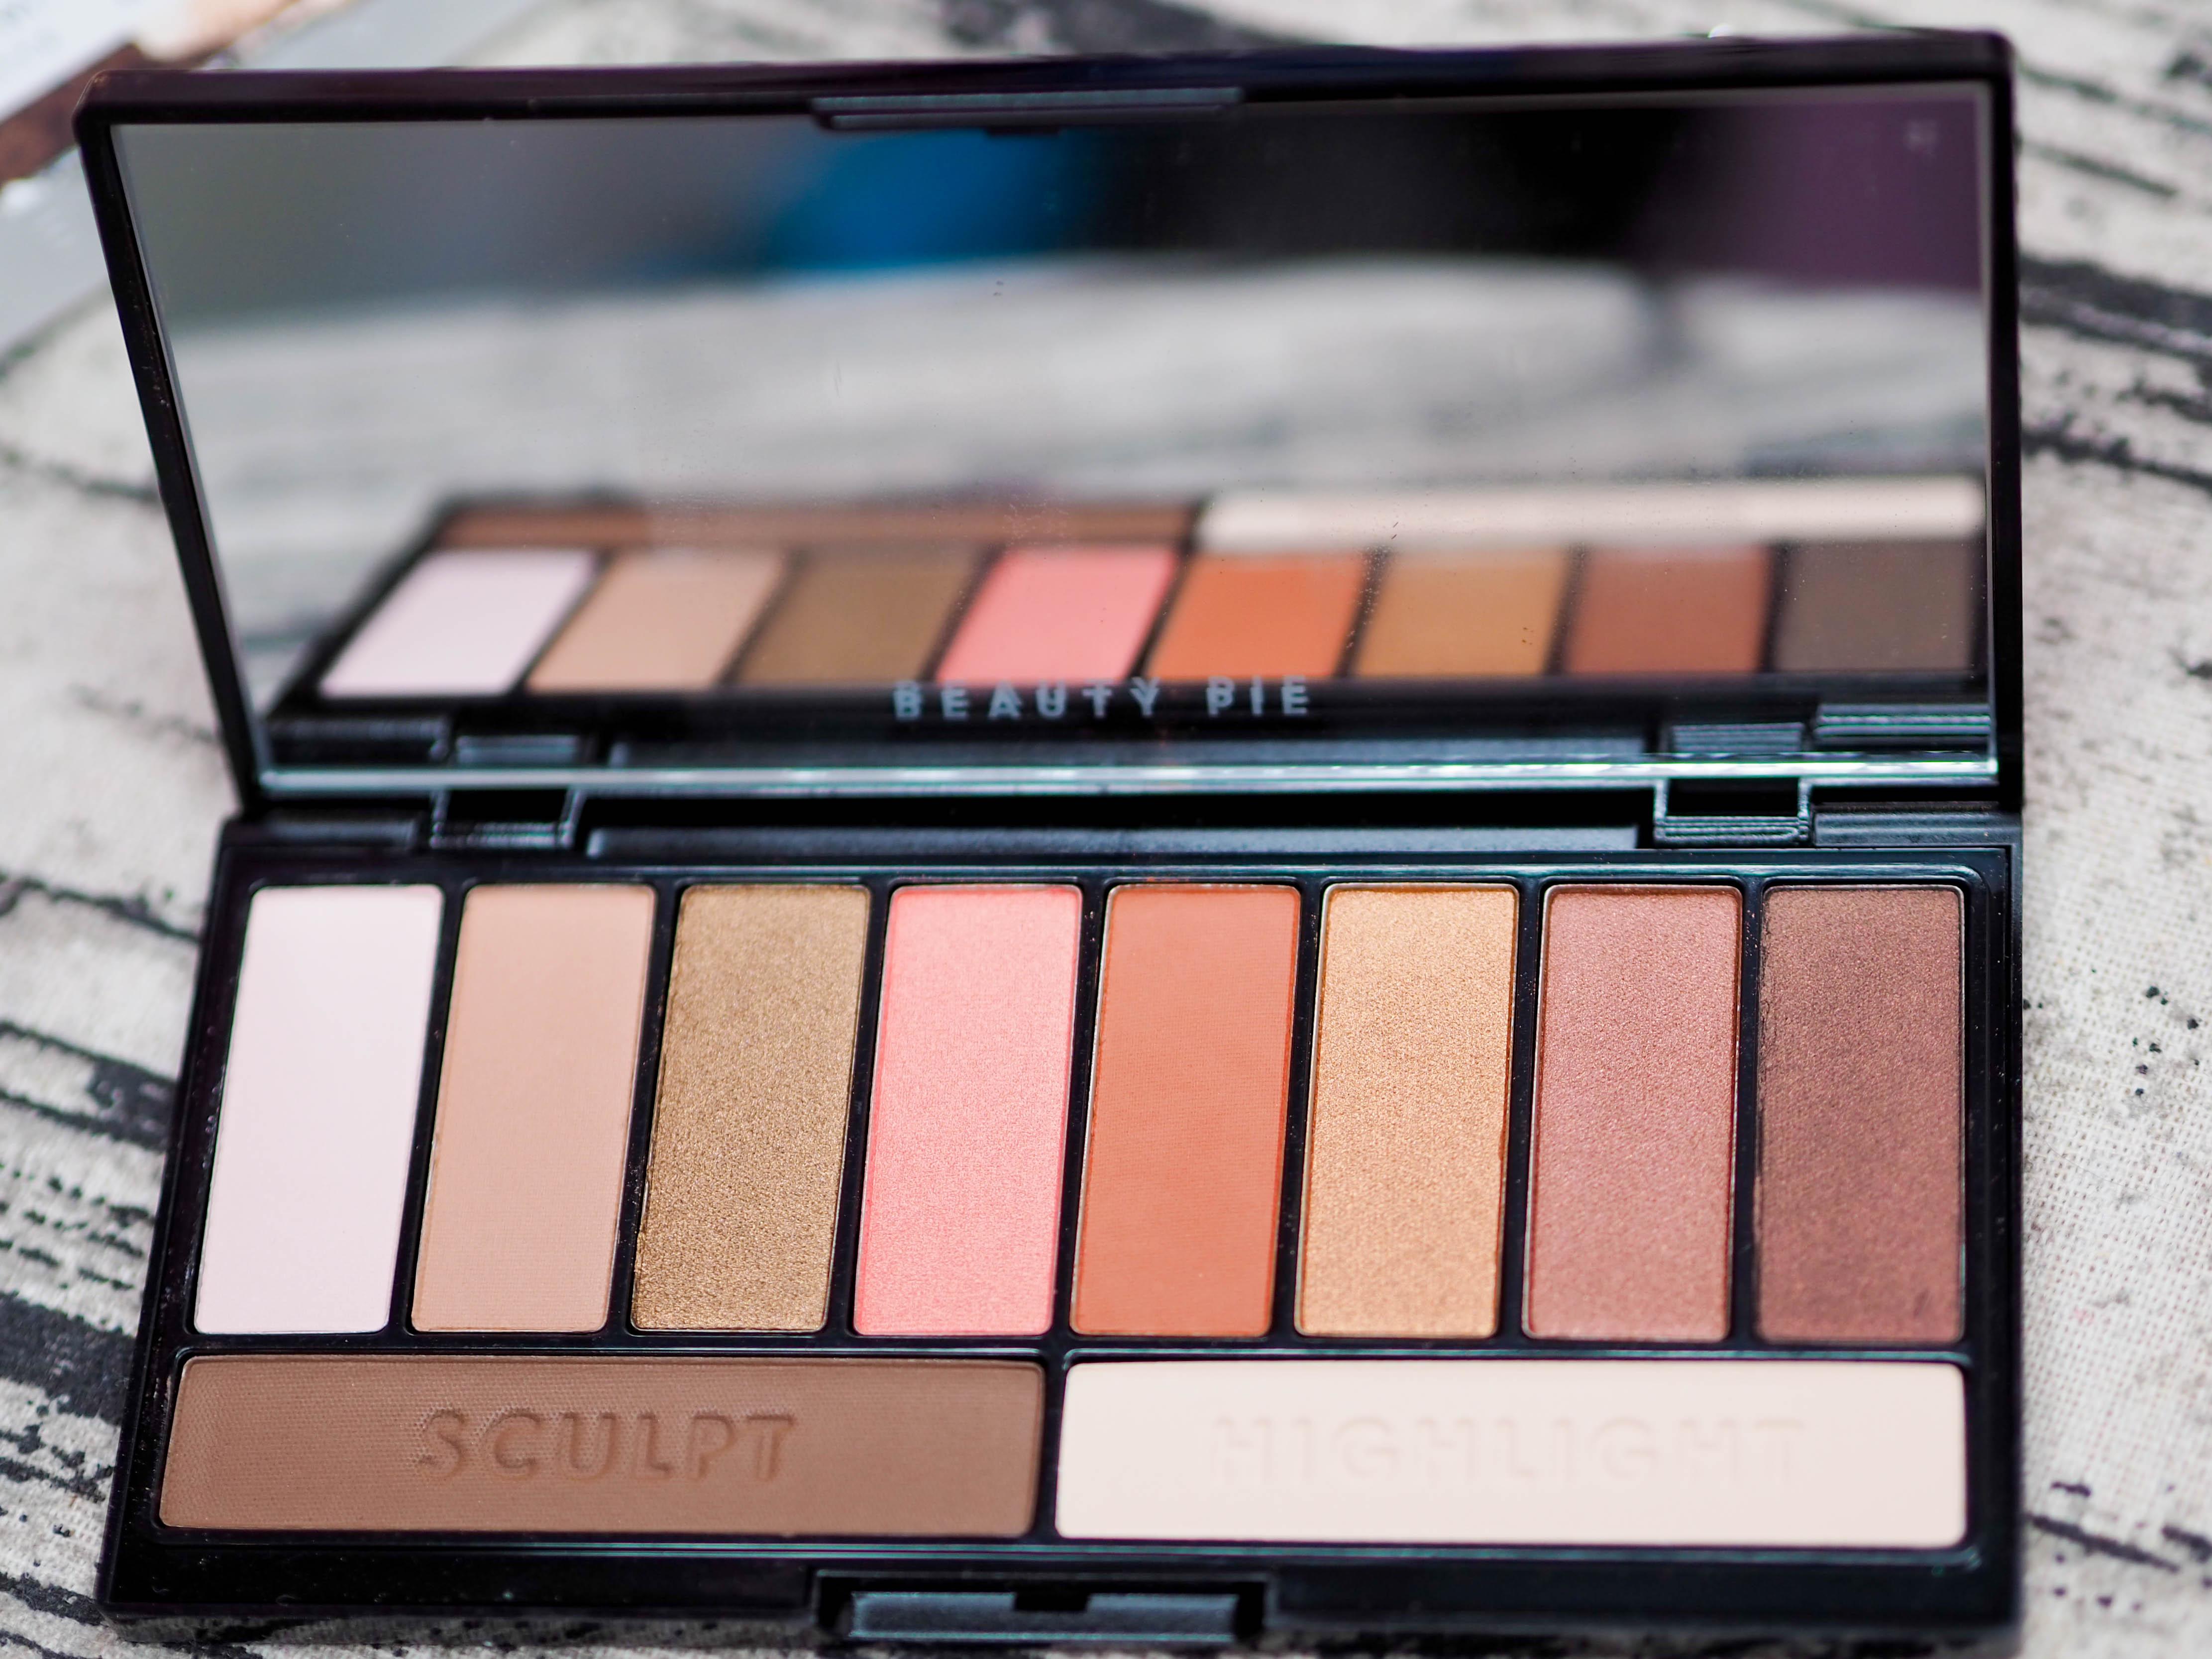 Beauty Pie Sunshiney Palette